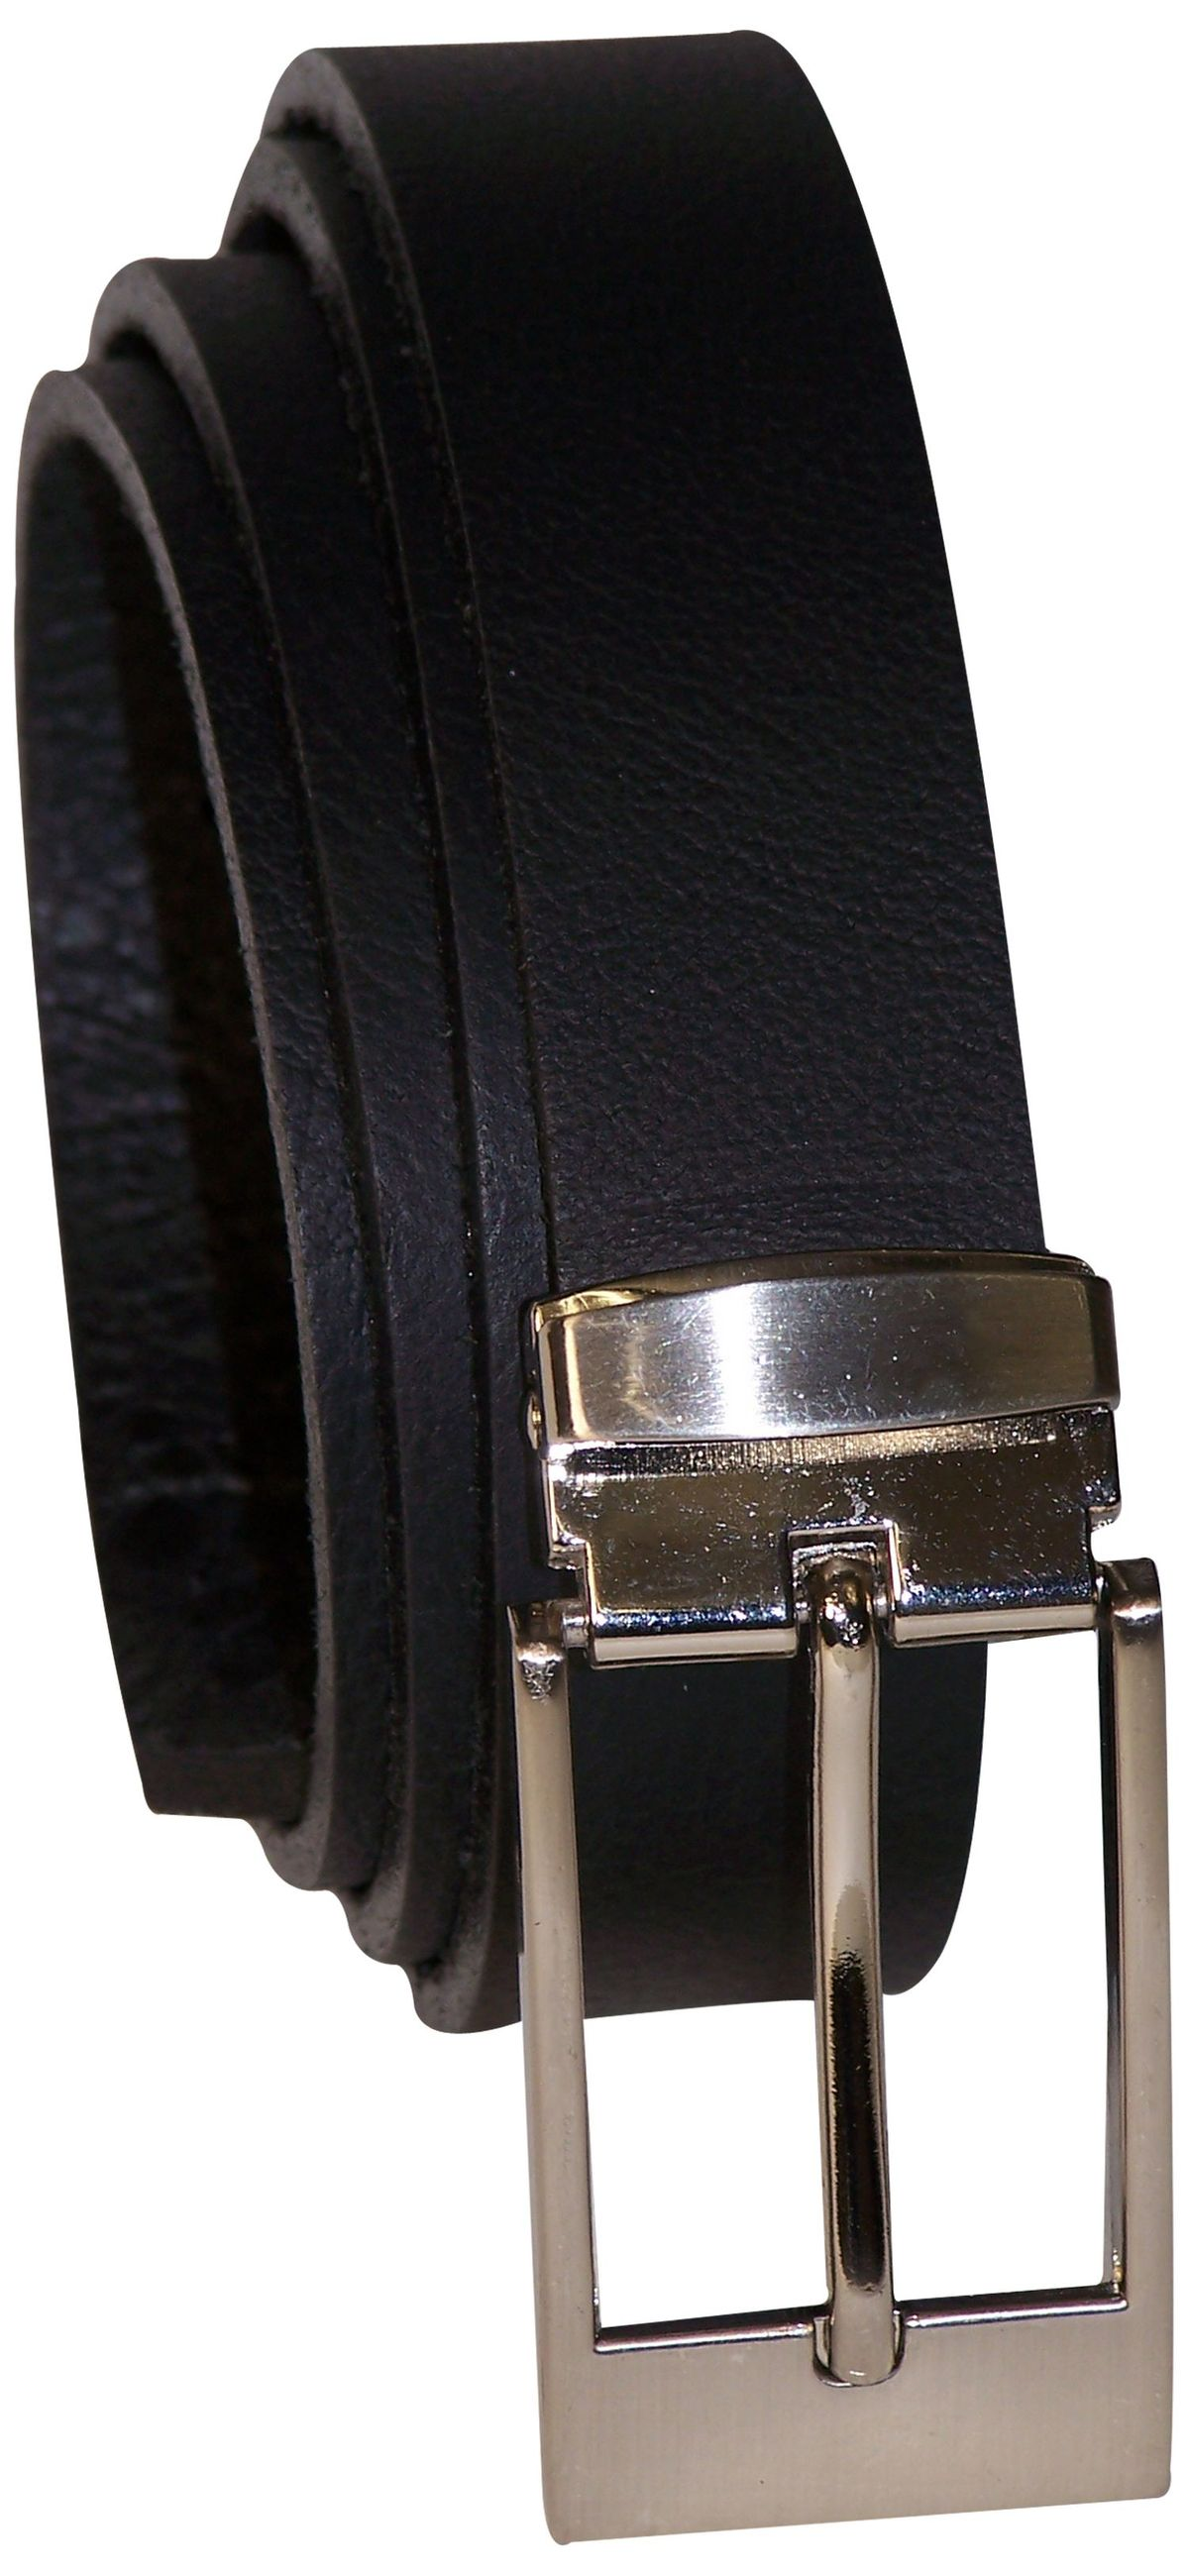 b.belt Gürtel Belt Damen Leder 100 cm schwarz